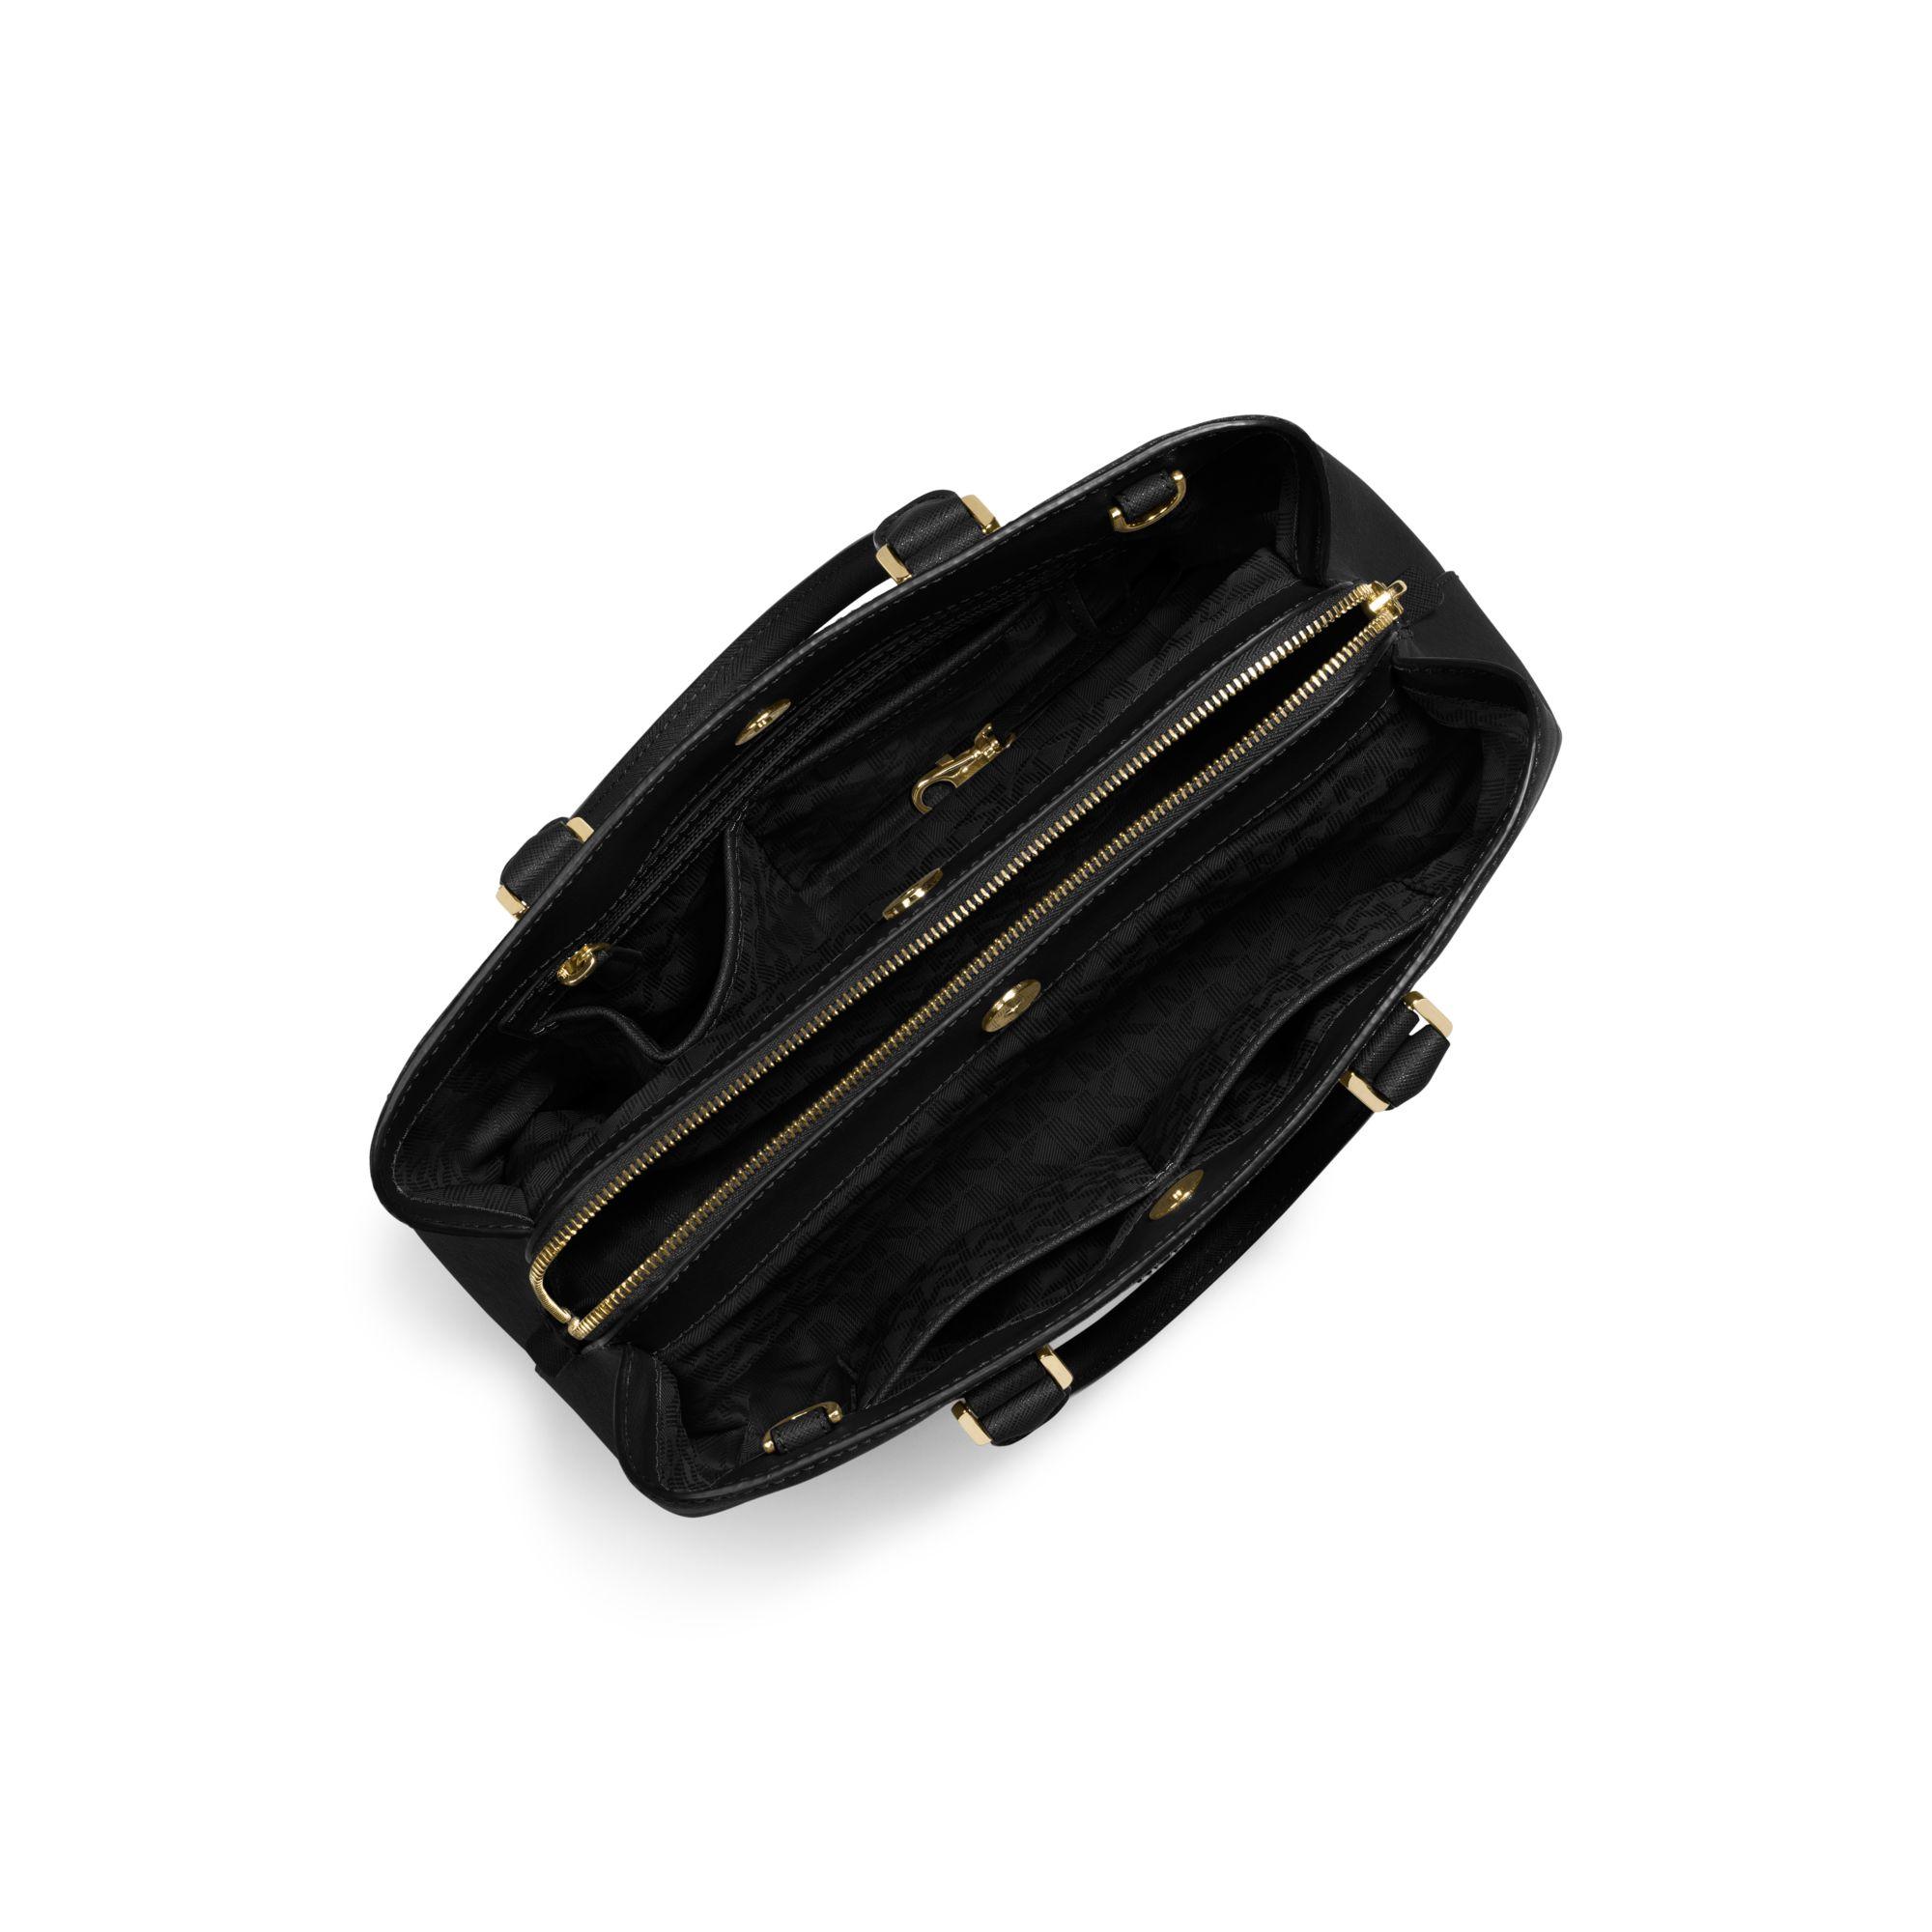 1accd2c60a1bbf michael kors savannah large patent saffiano leather satchel small saffiano  leather satchel